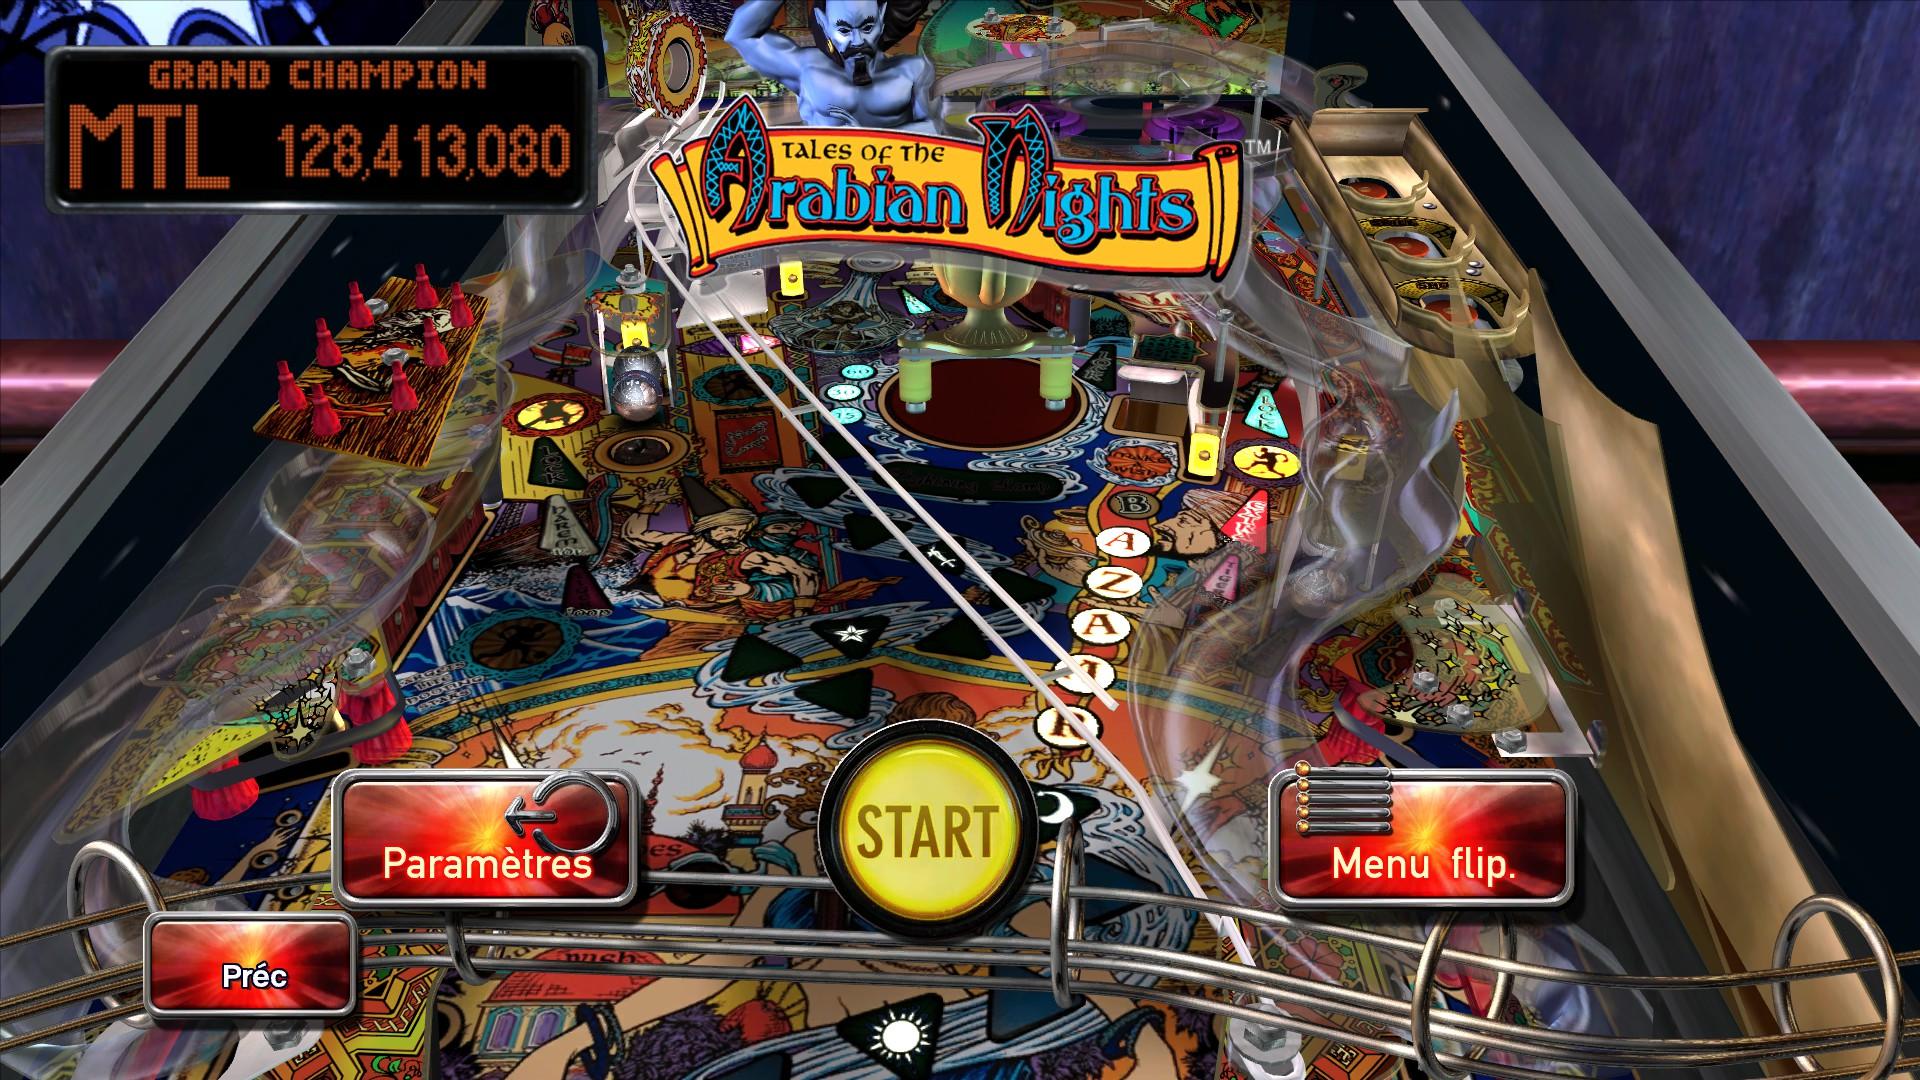 Mantalow: Pinball Arcade: Arabian Knights (PC) 128,413,080 points on 2015-03-06 11:21:59